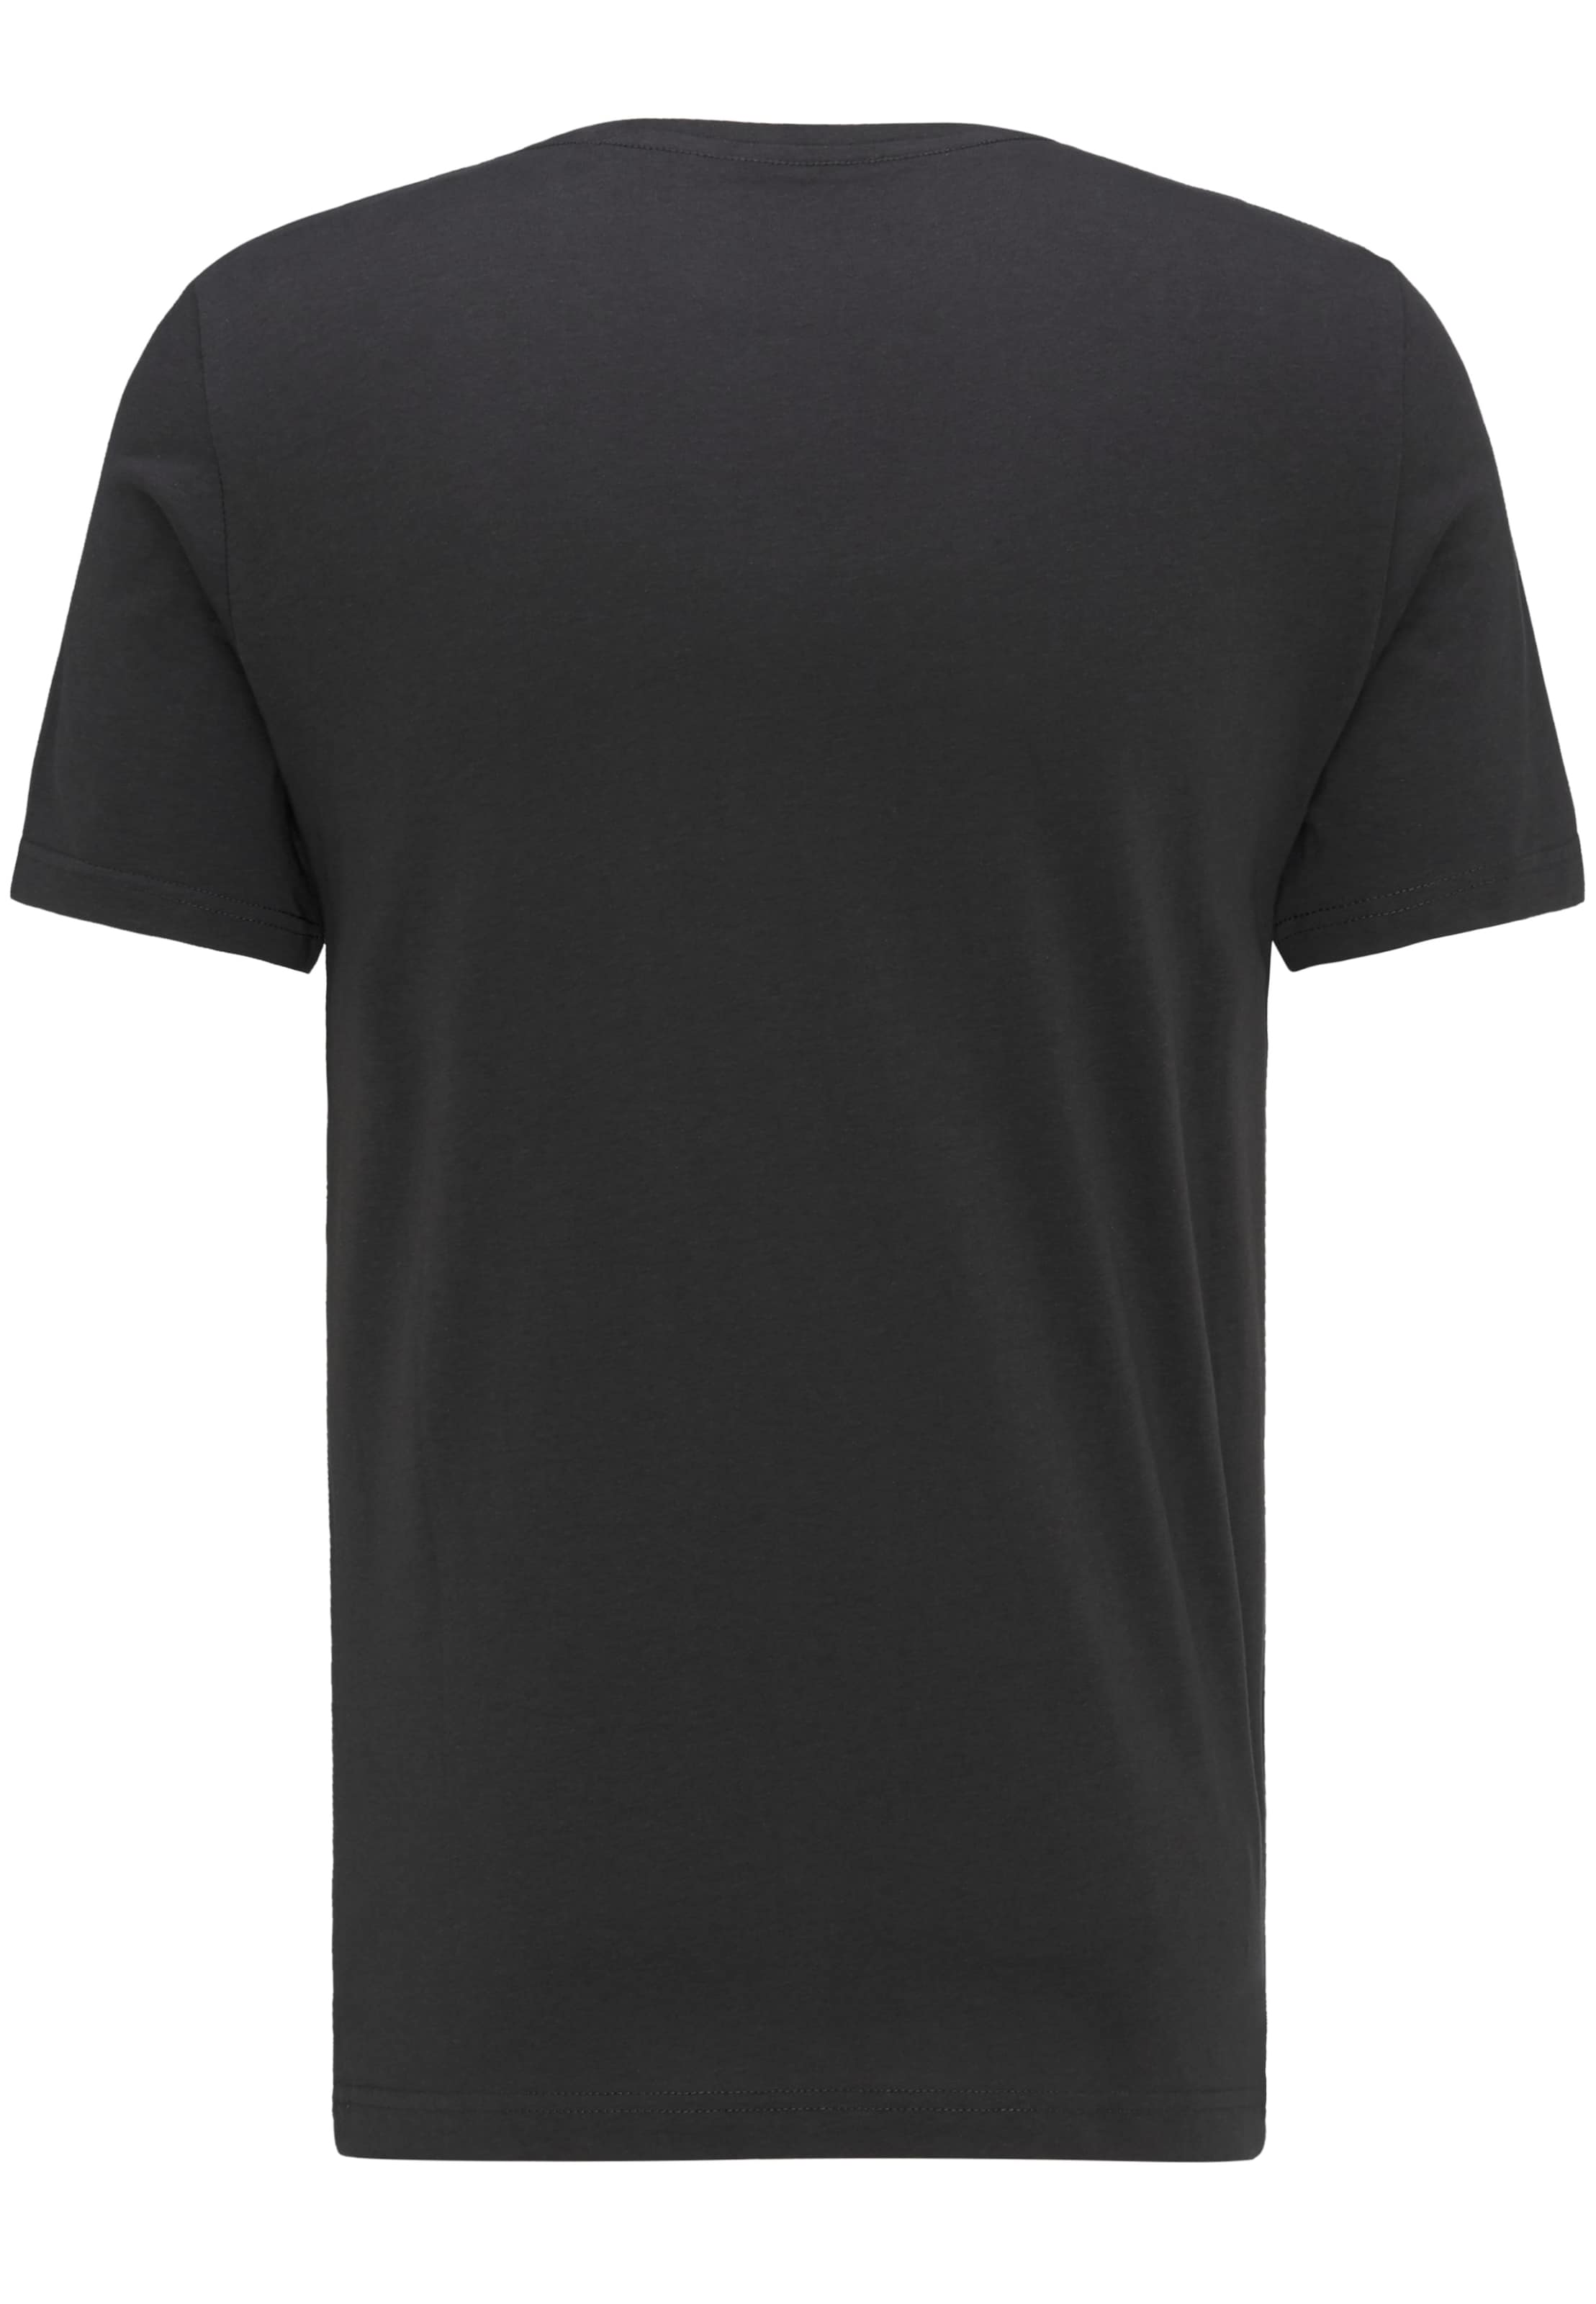 Tee' AnthrazitHellpink Mustang 'wording shirt In T PkuZOXTi